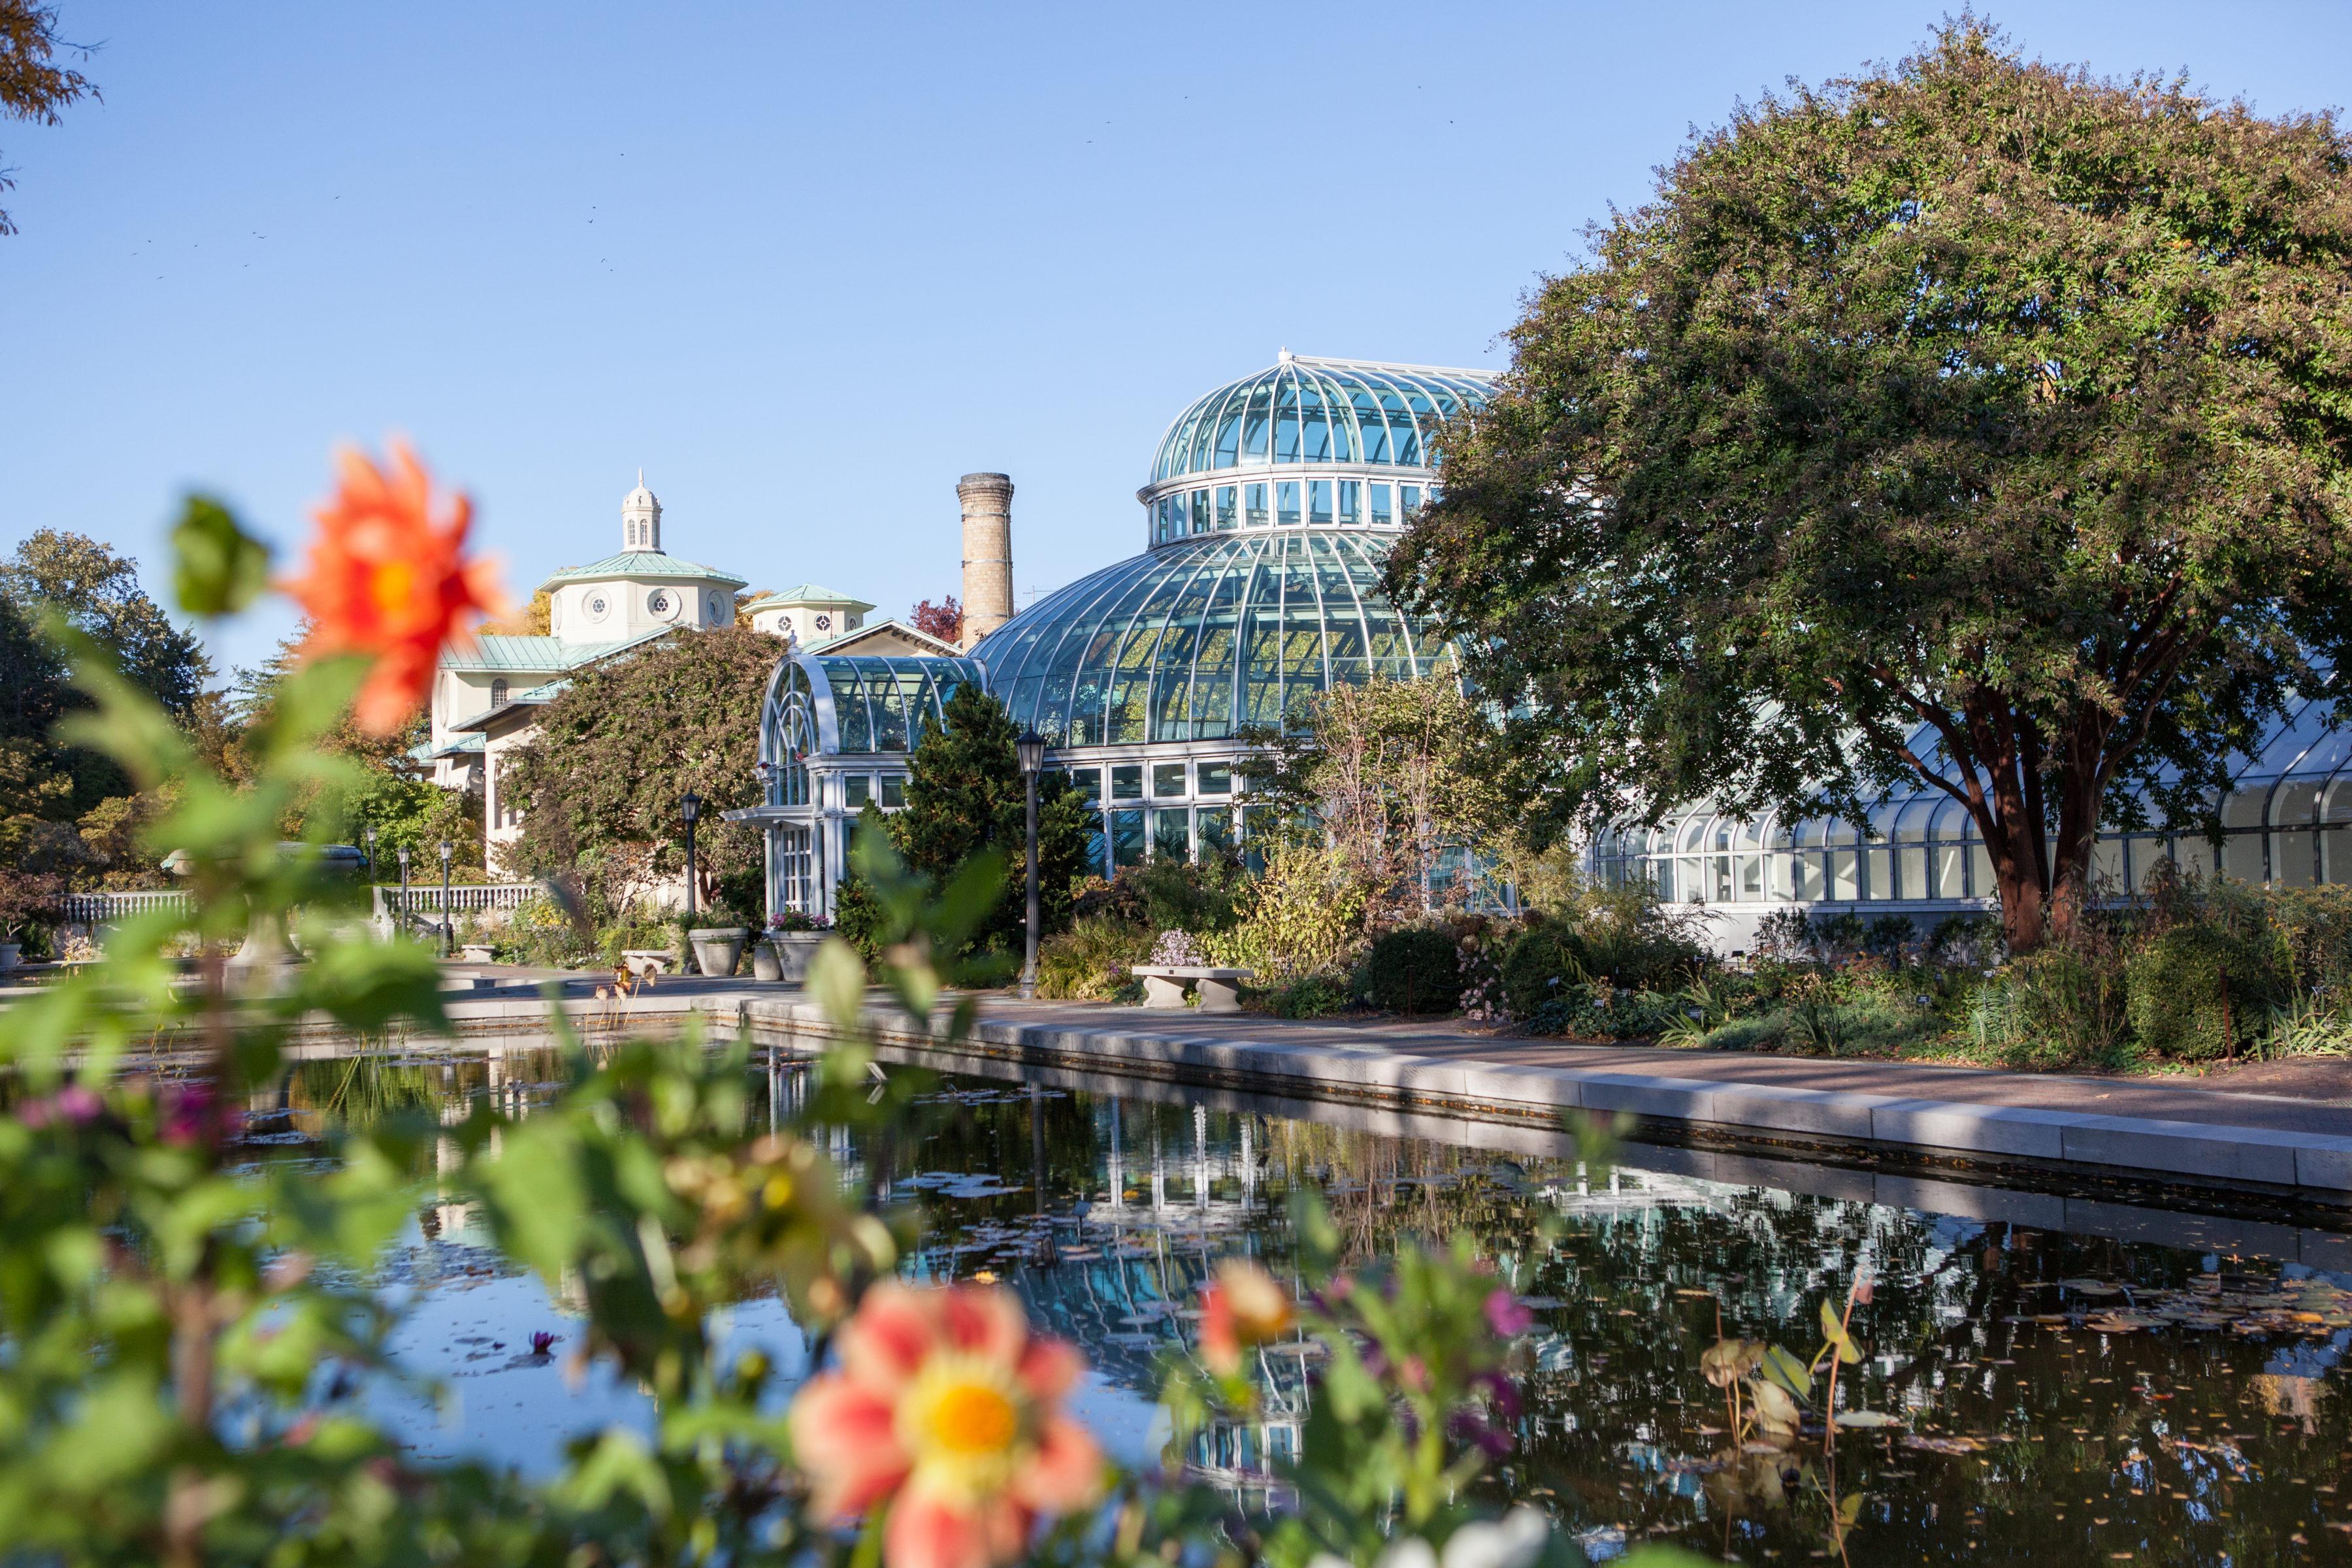 brooklyn botanic - Brooklyn Botanic Garden